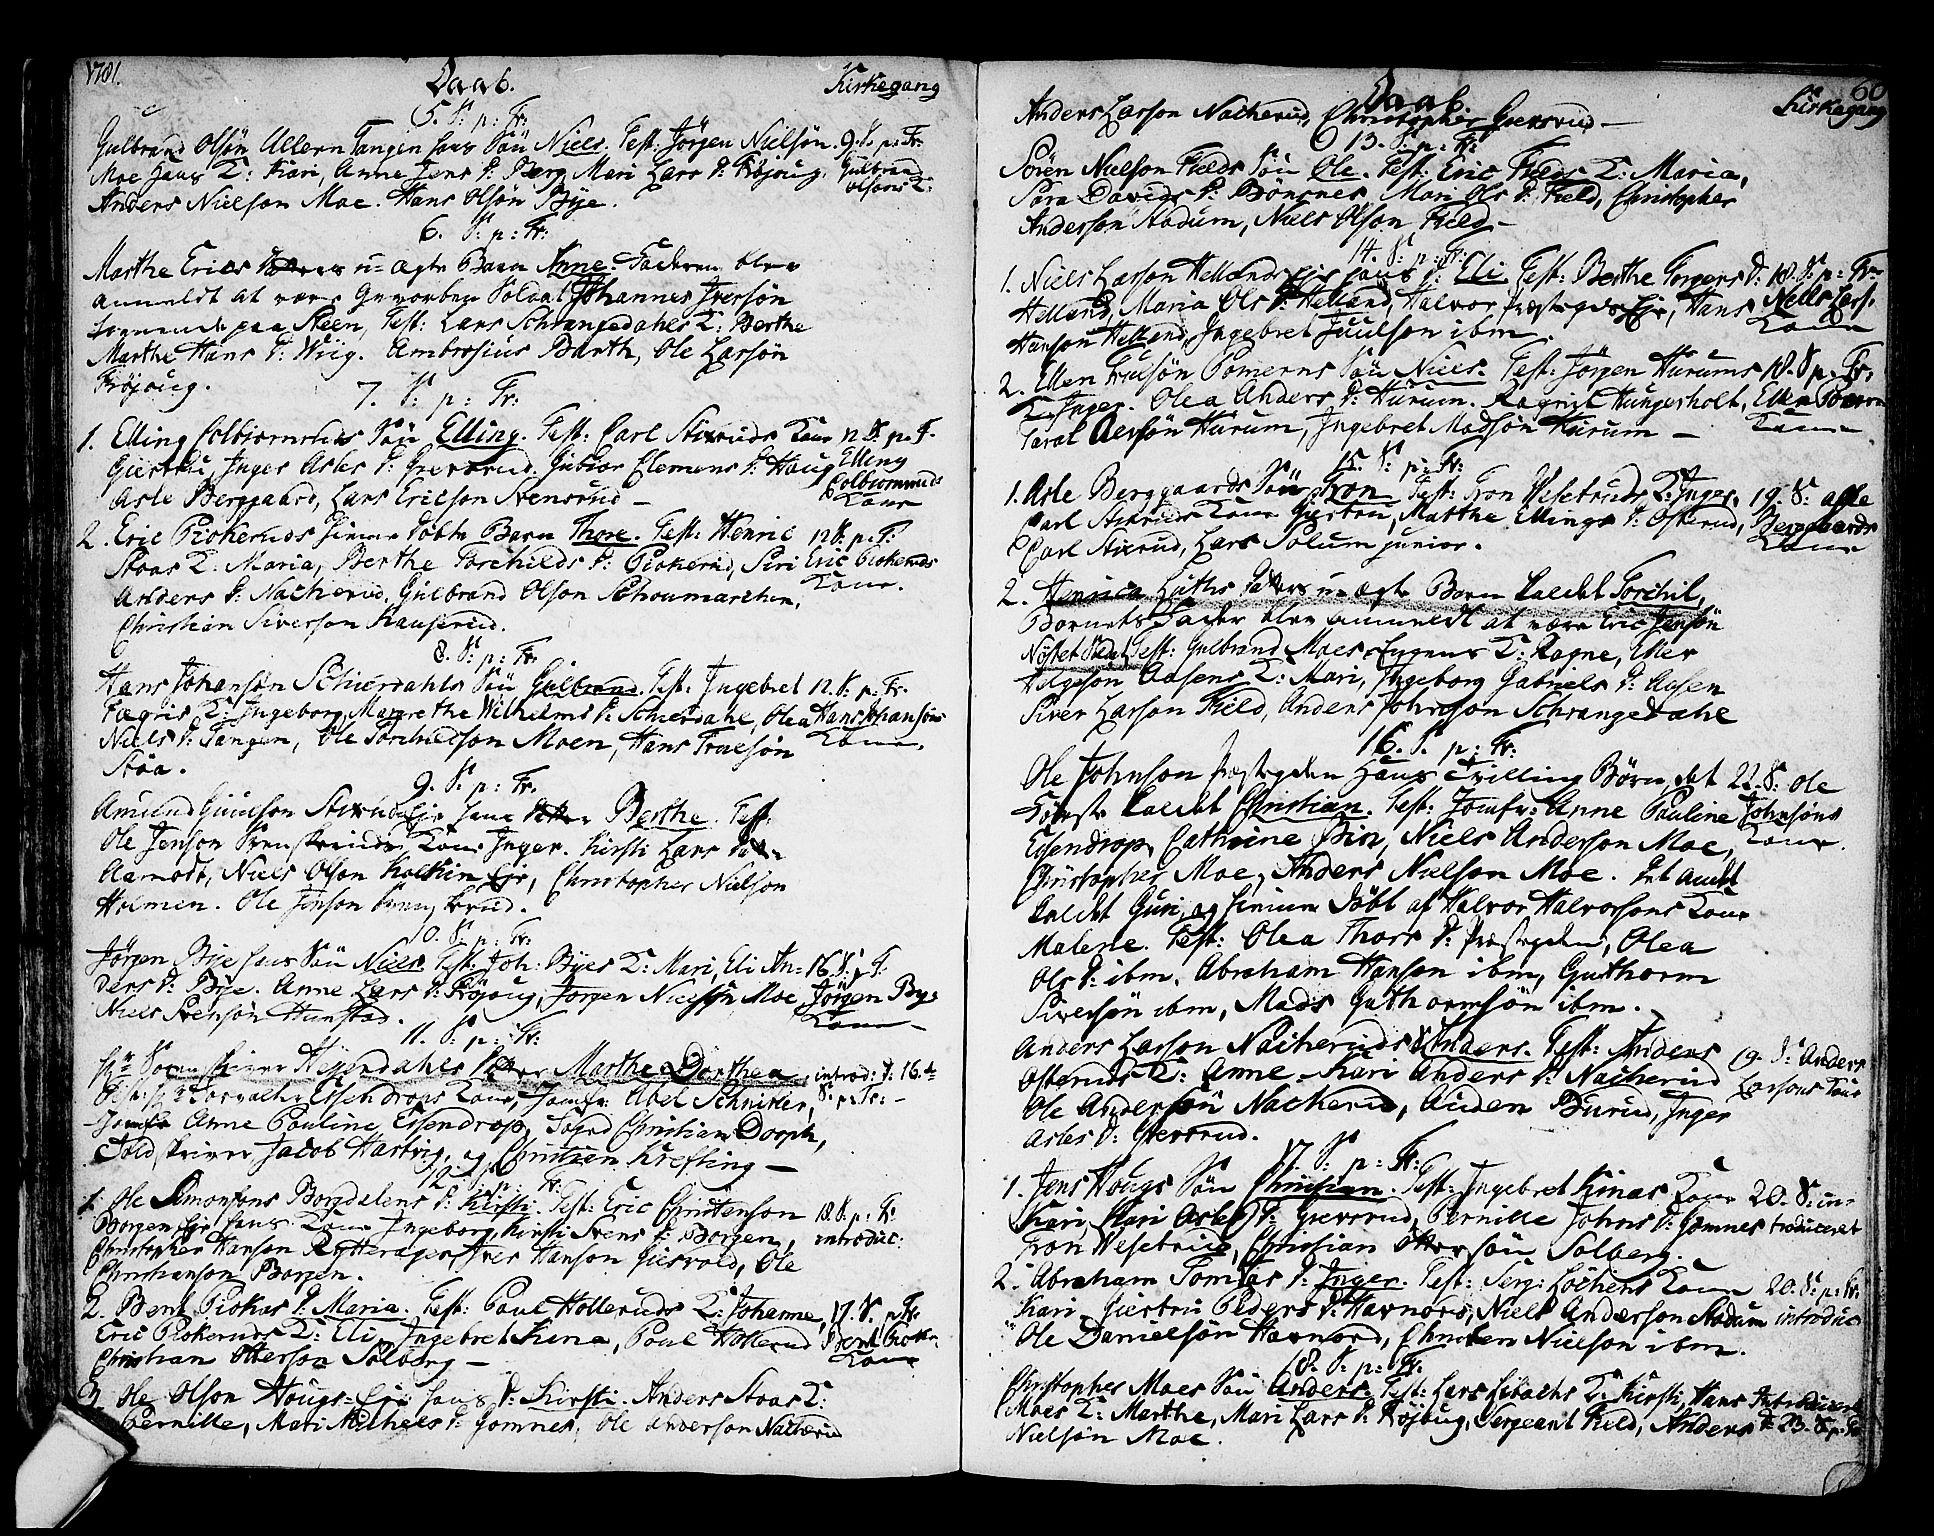 SAKO, Hole kirkebøker, F/Fa/L0002: Ministerialbok nr. I 2, 1766-1814, s. 60